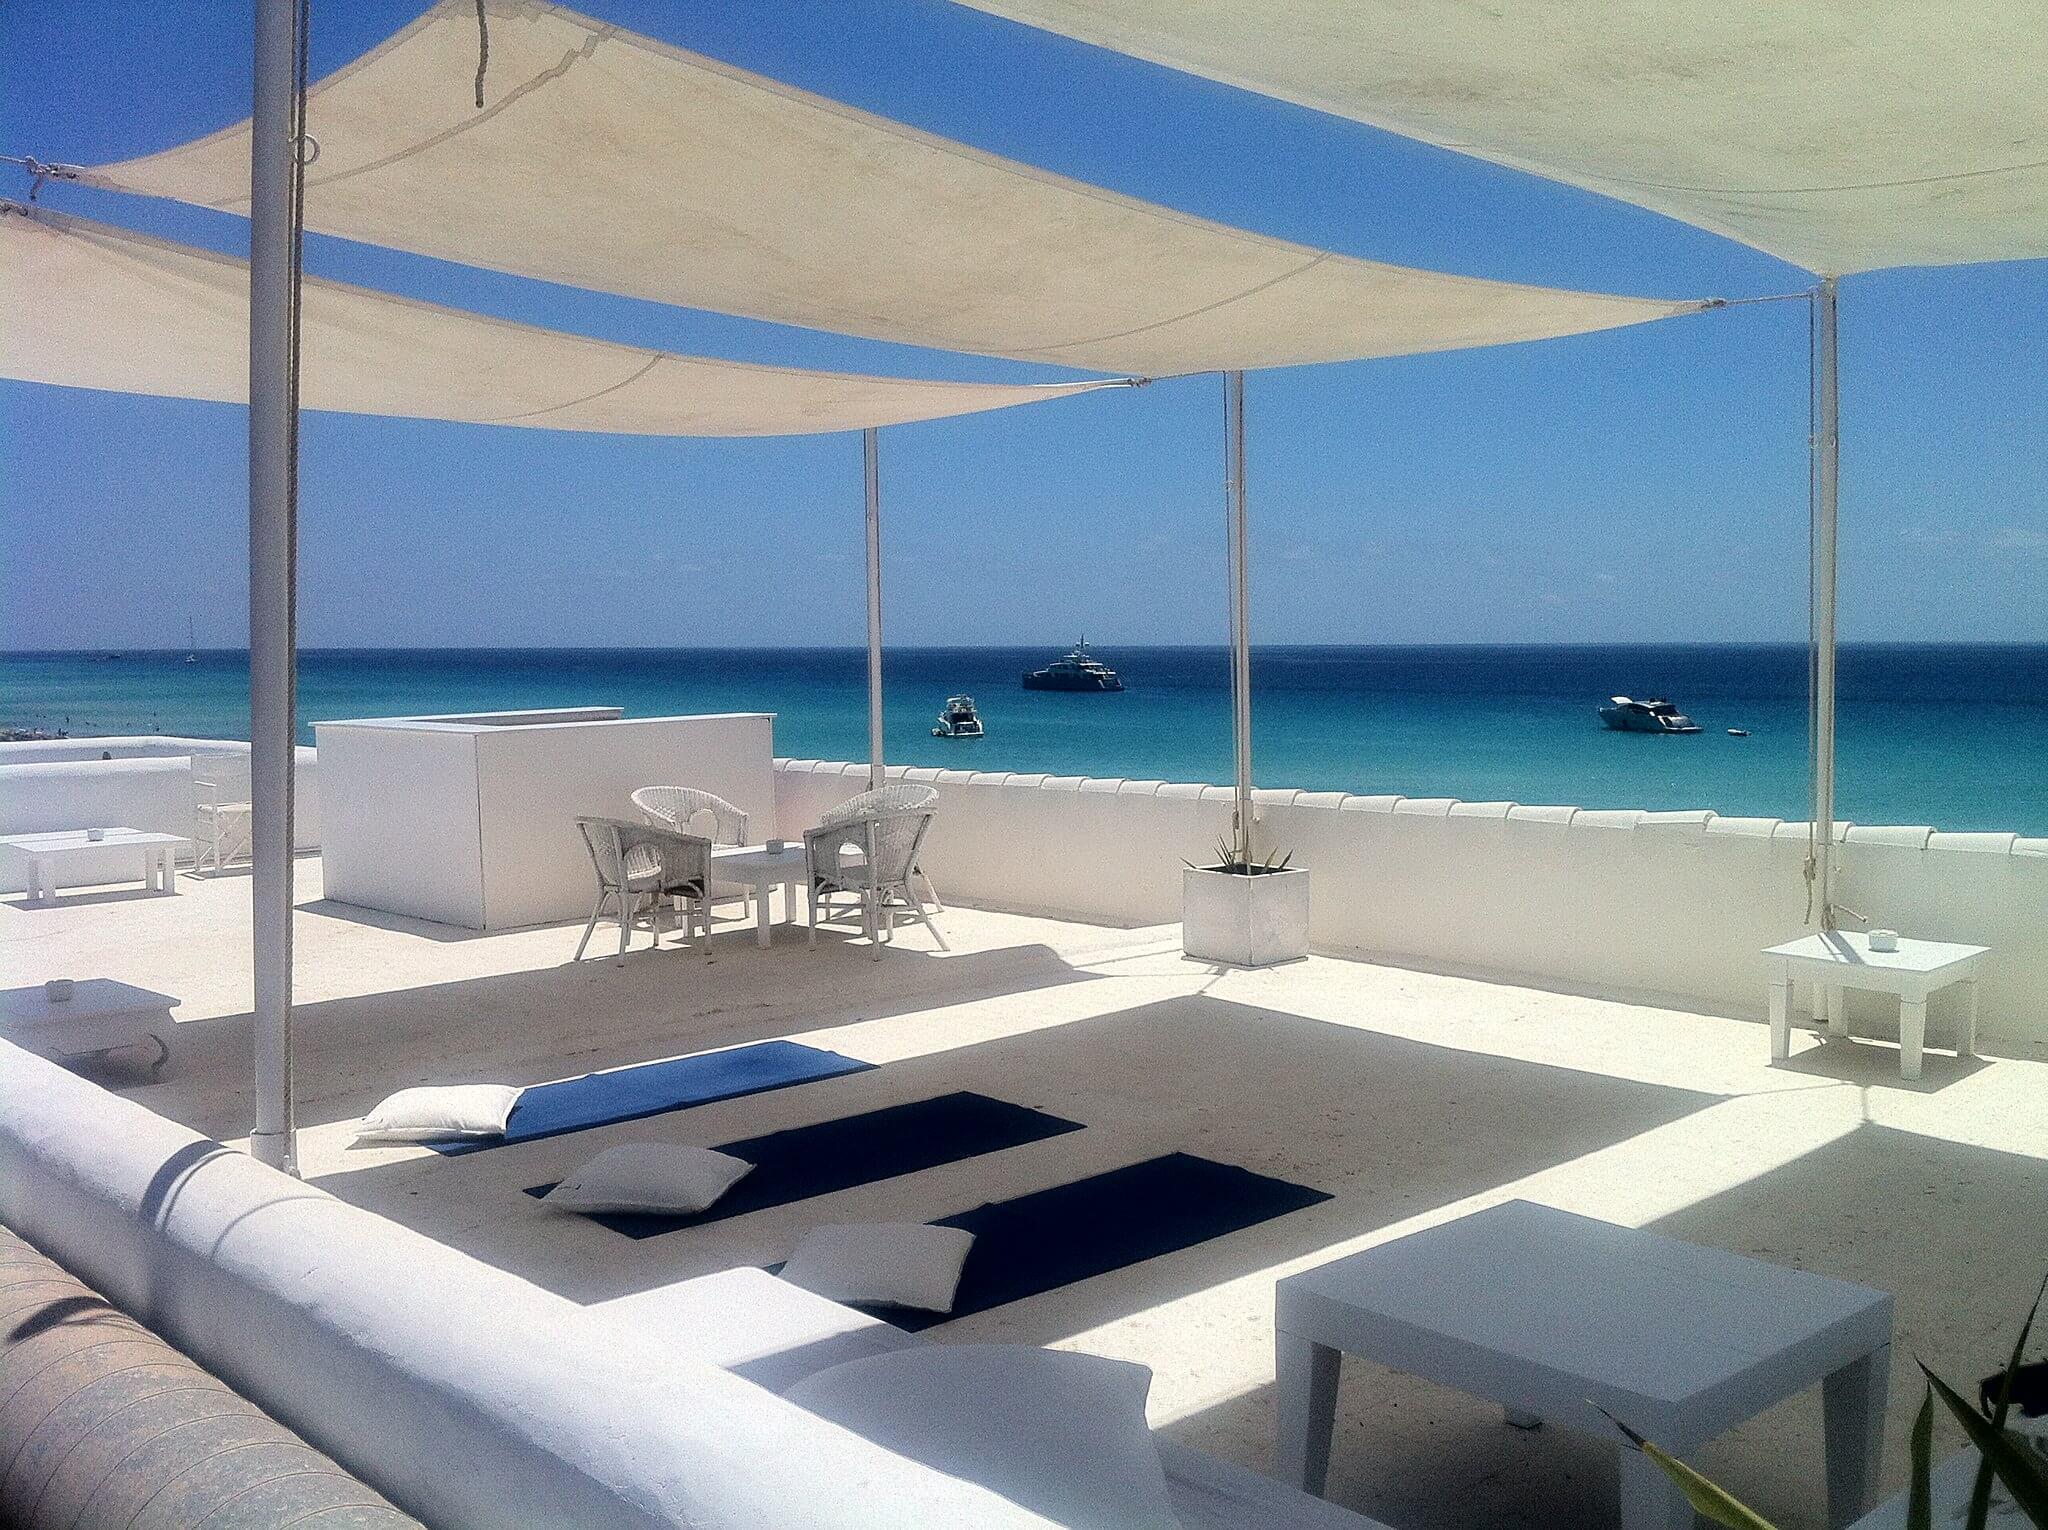 https://www.white-ibiza.com/wp-content/uploads/2020/03/formentera-beach-restaurants-10-punto7-2020-01.jpg